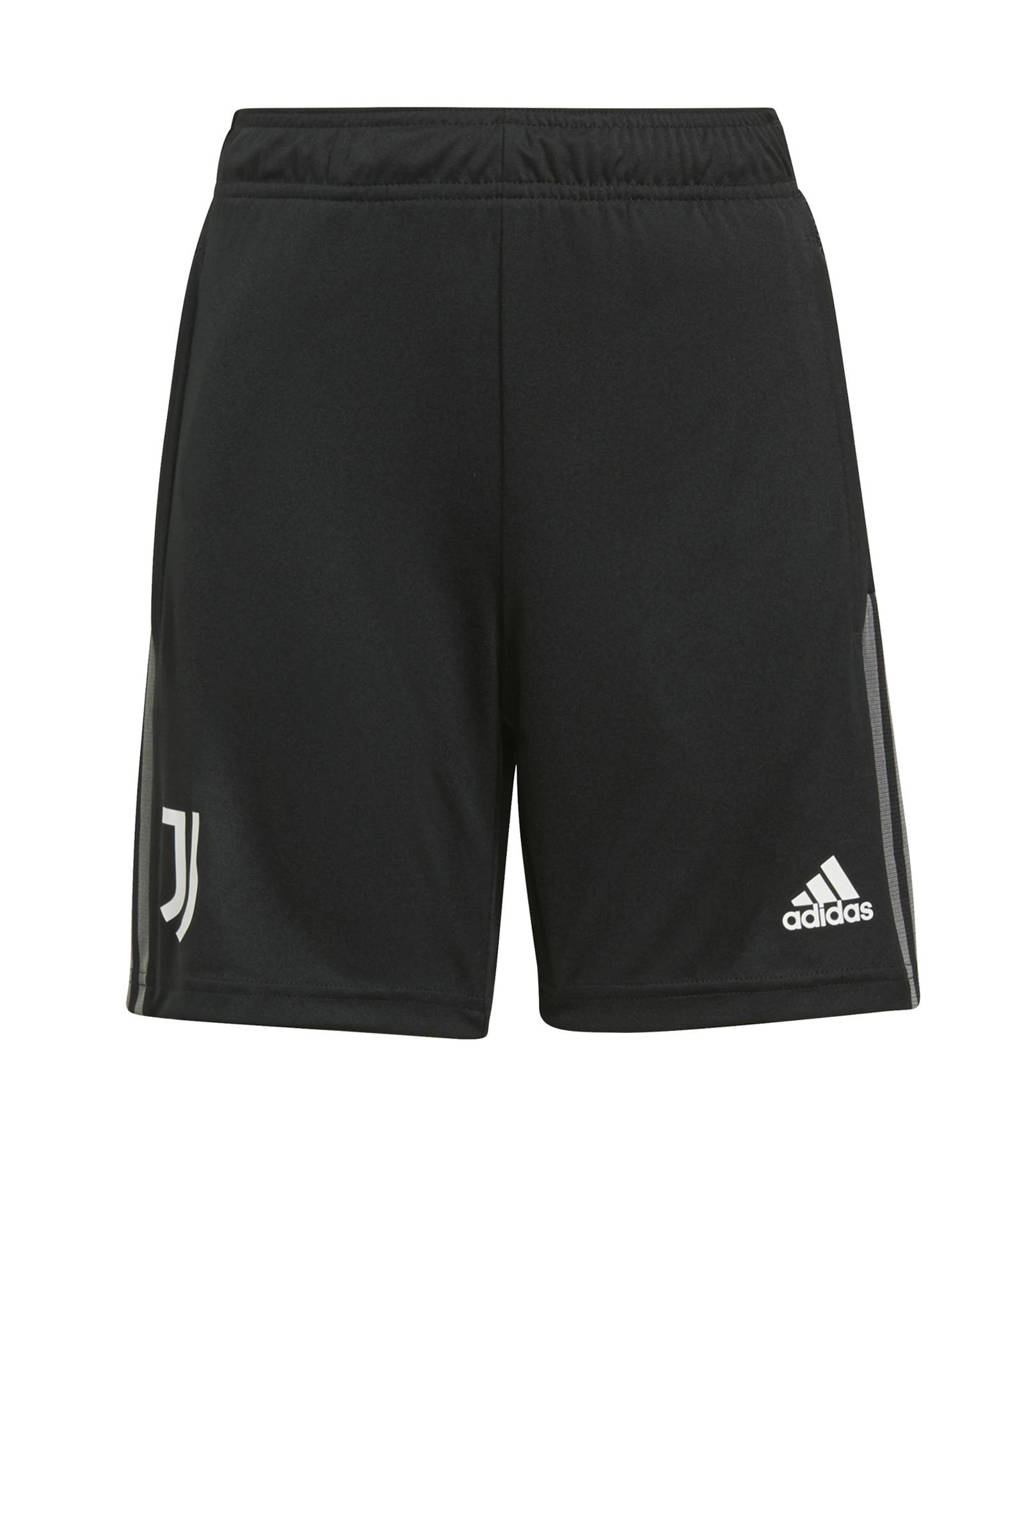 adidas Performance Junior Juventus FC voetbalshort training zwart, Zwart